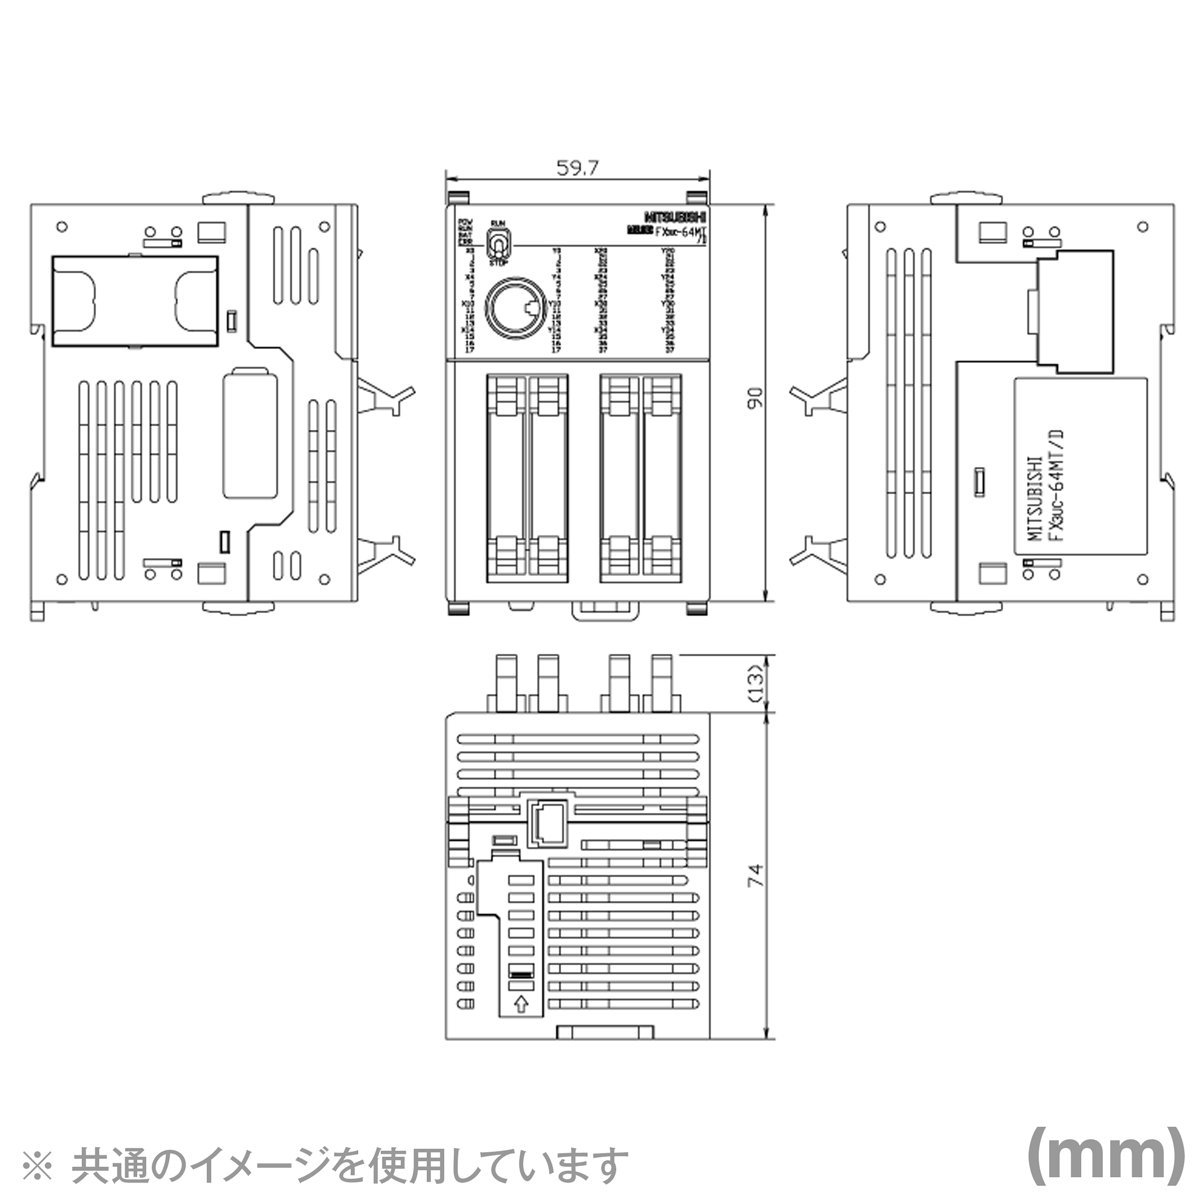 MITSUBISHI ELECTRIC FX3UC-64MT/D FX3UC Main Units (Input type:24V DC(Sink) Output type:Transistor(Sink)) NN